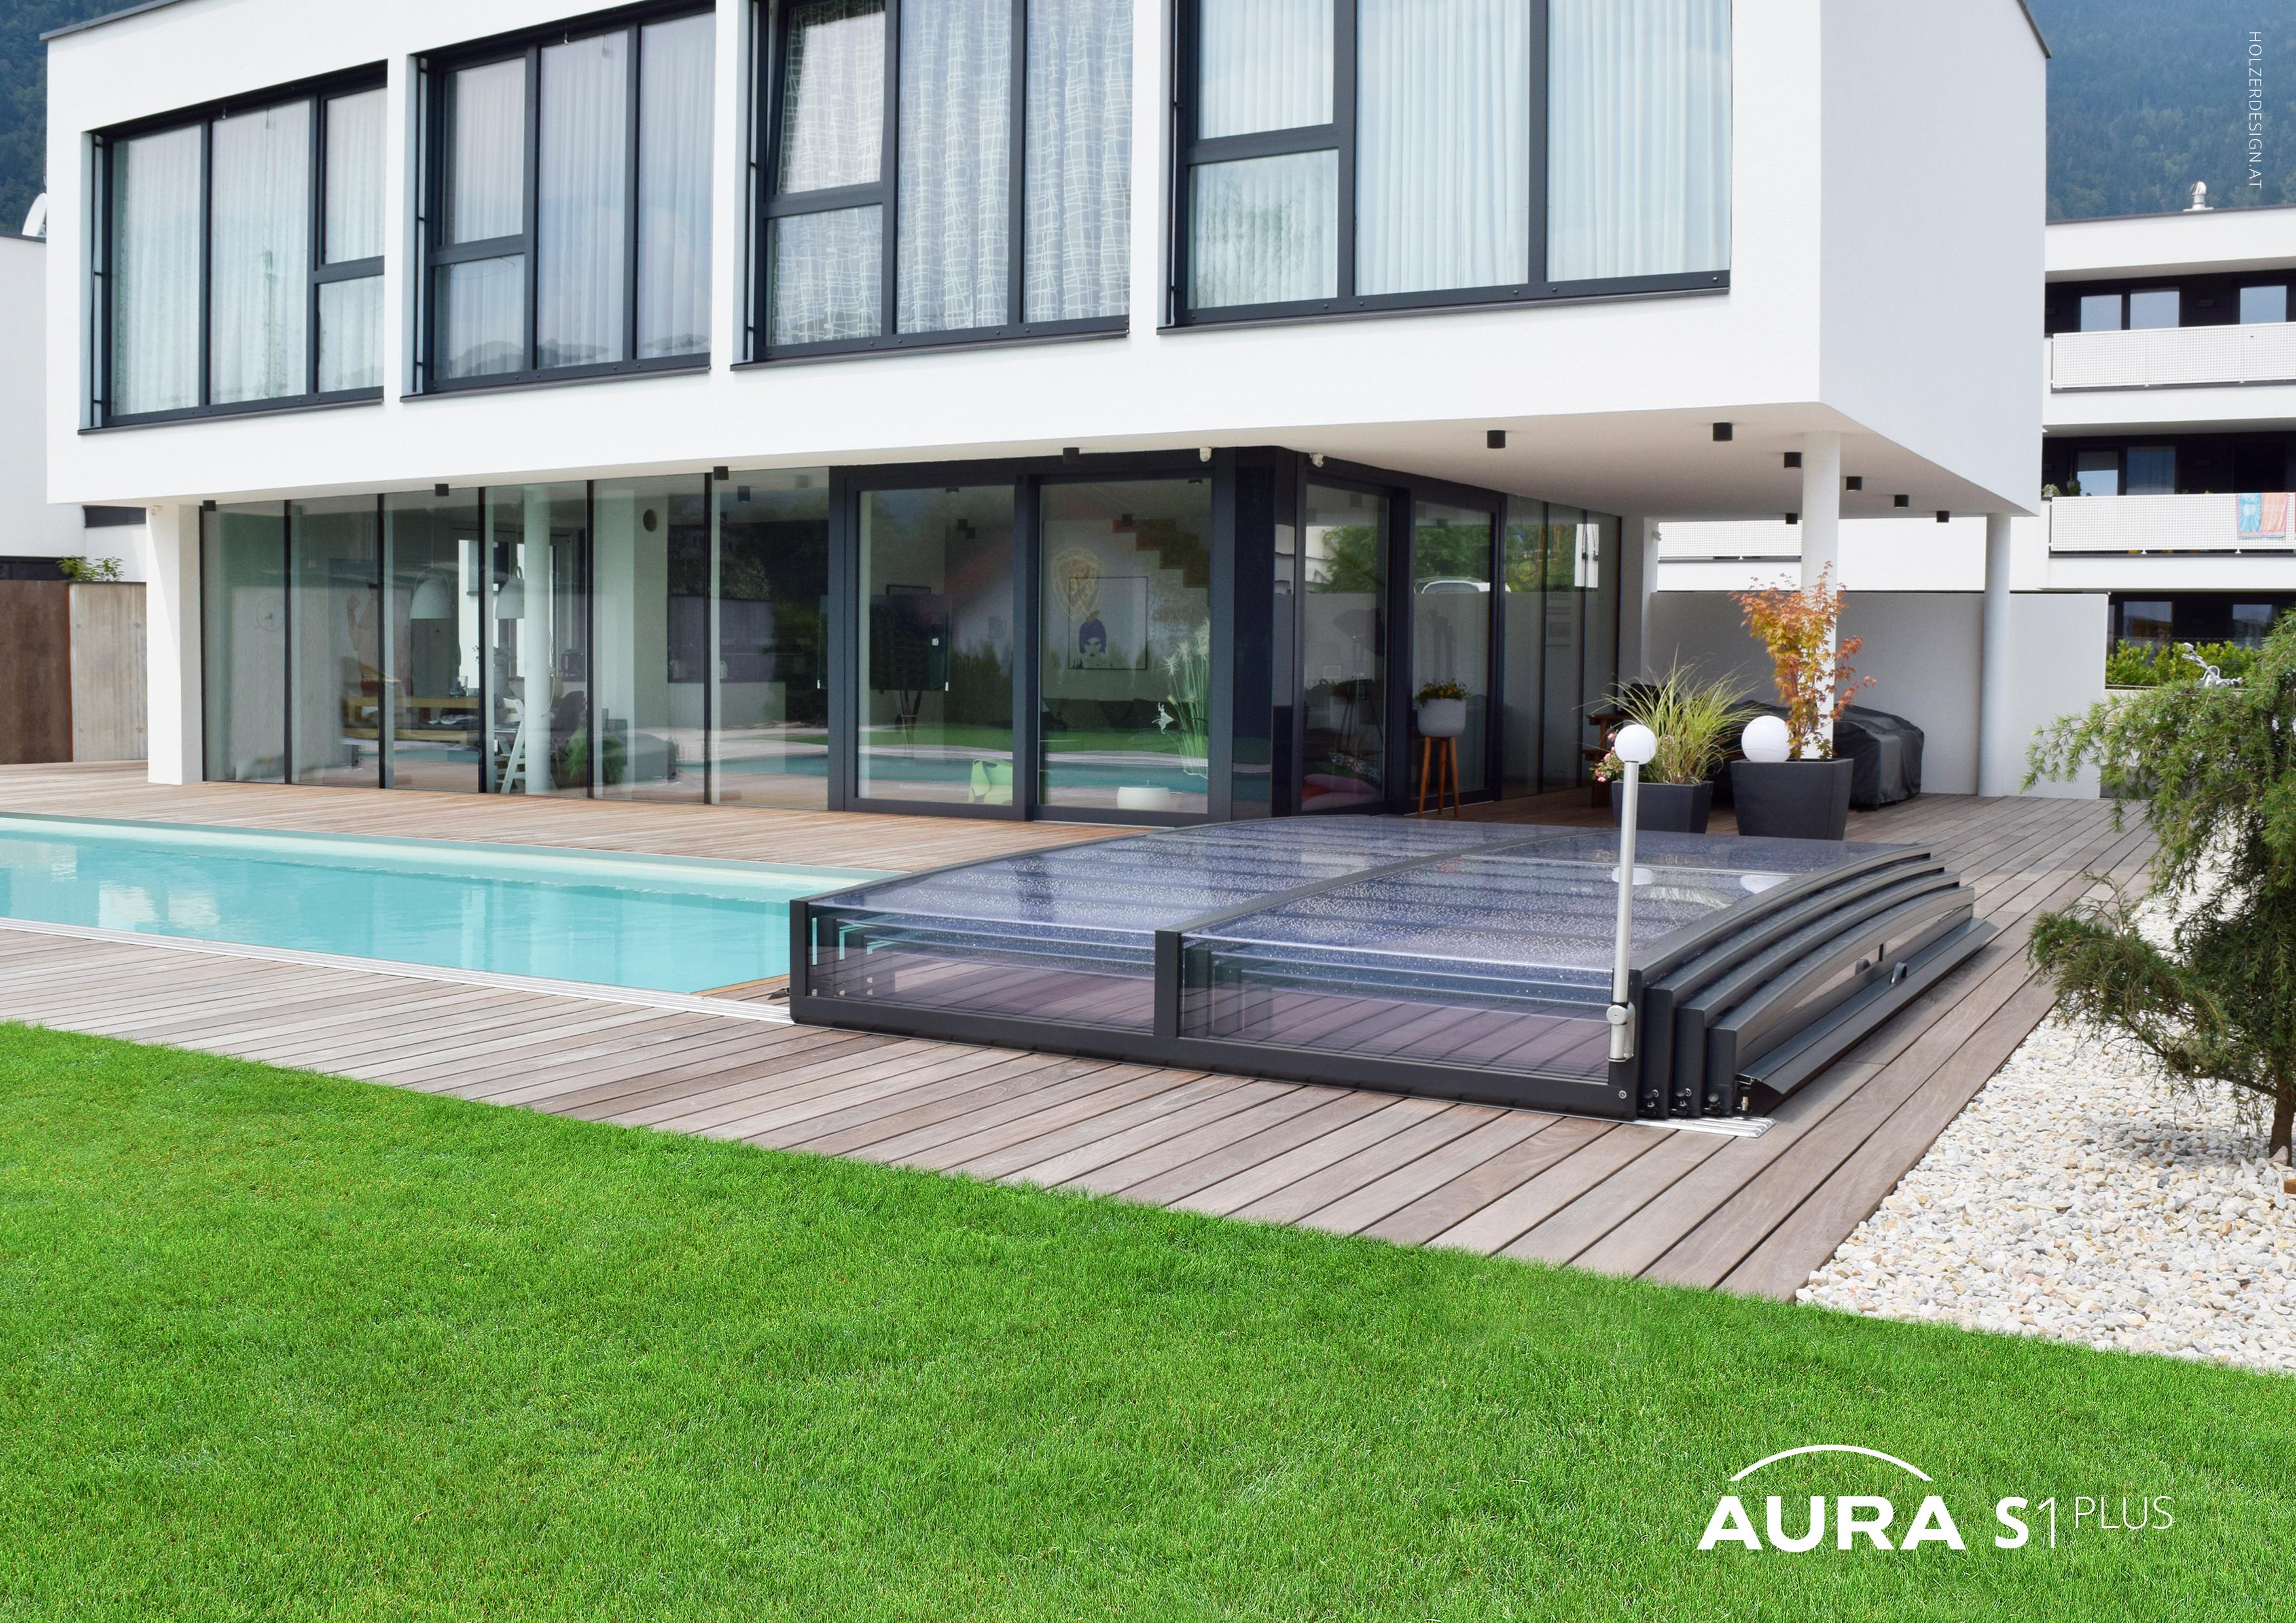 aura-s1plus-8-19.jpg